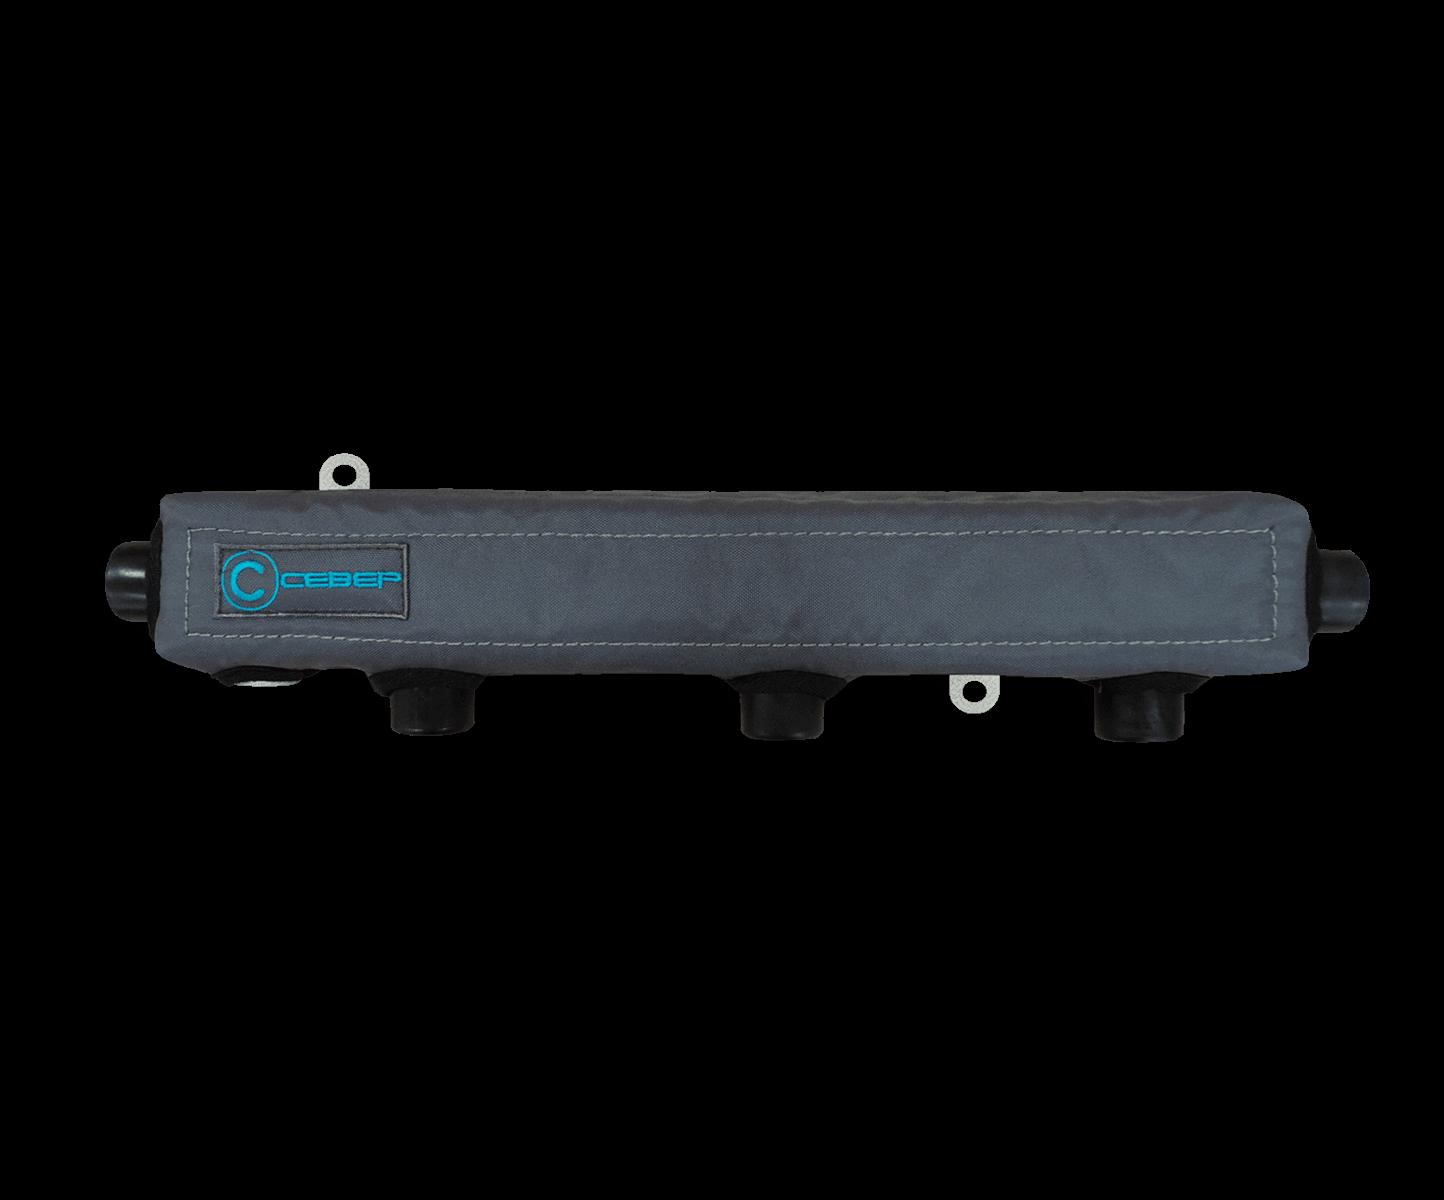 Теплоизоляция, теплоизоляционный чехол для гидрообвязки Север К3